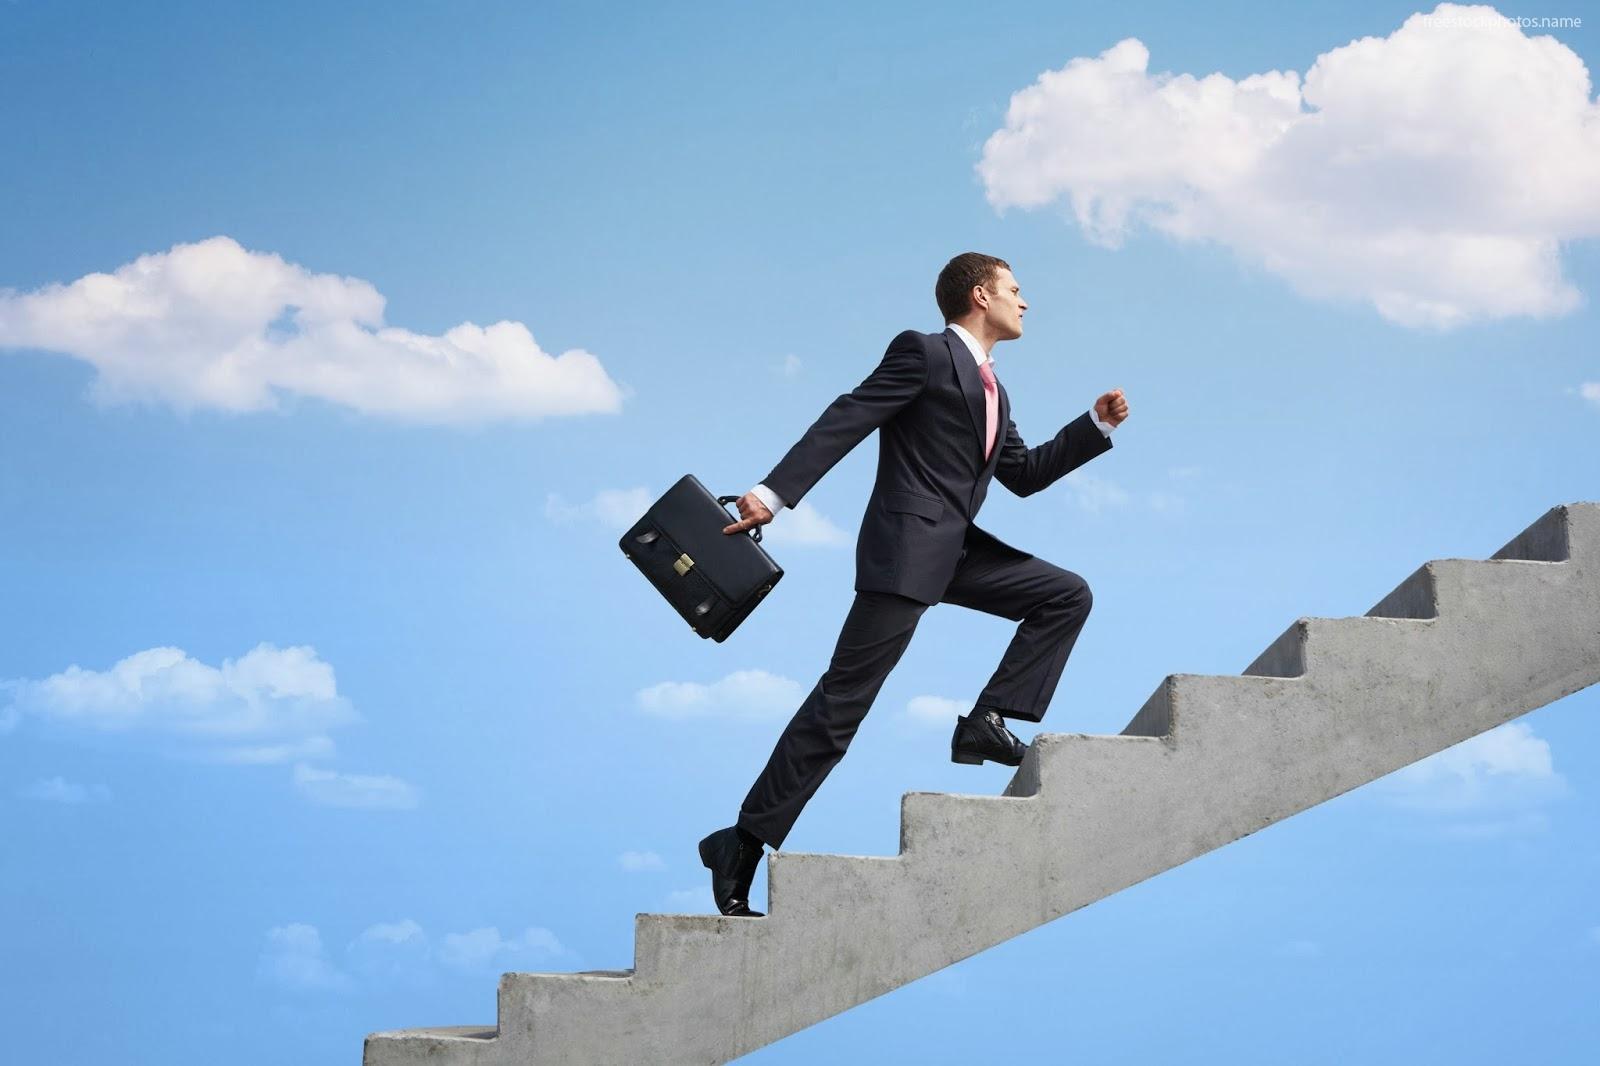 administrativosss Амжилт хэнд ирдэг вэ?